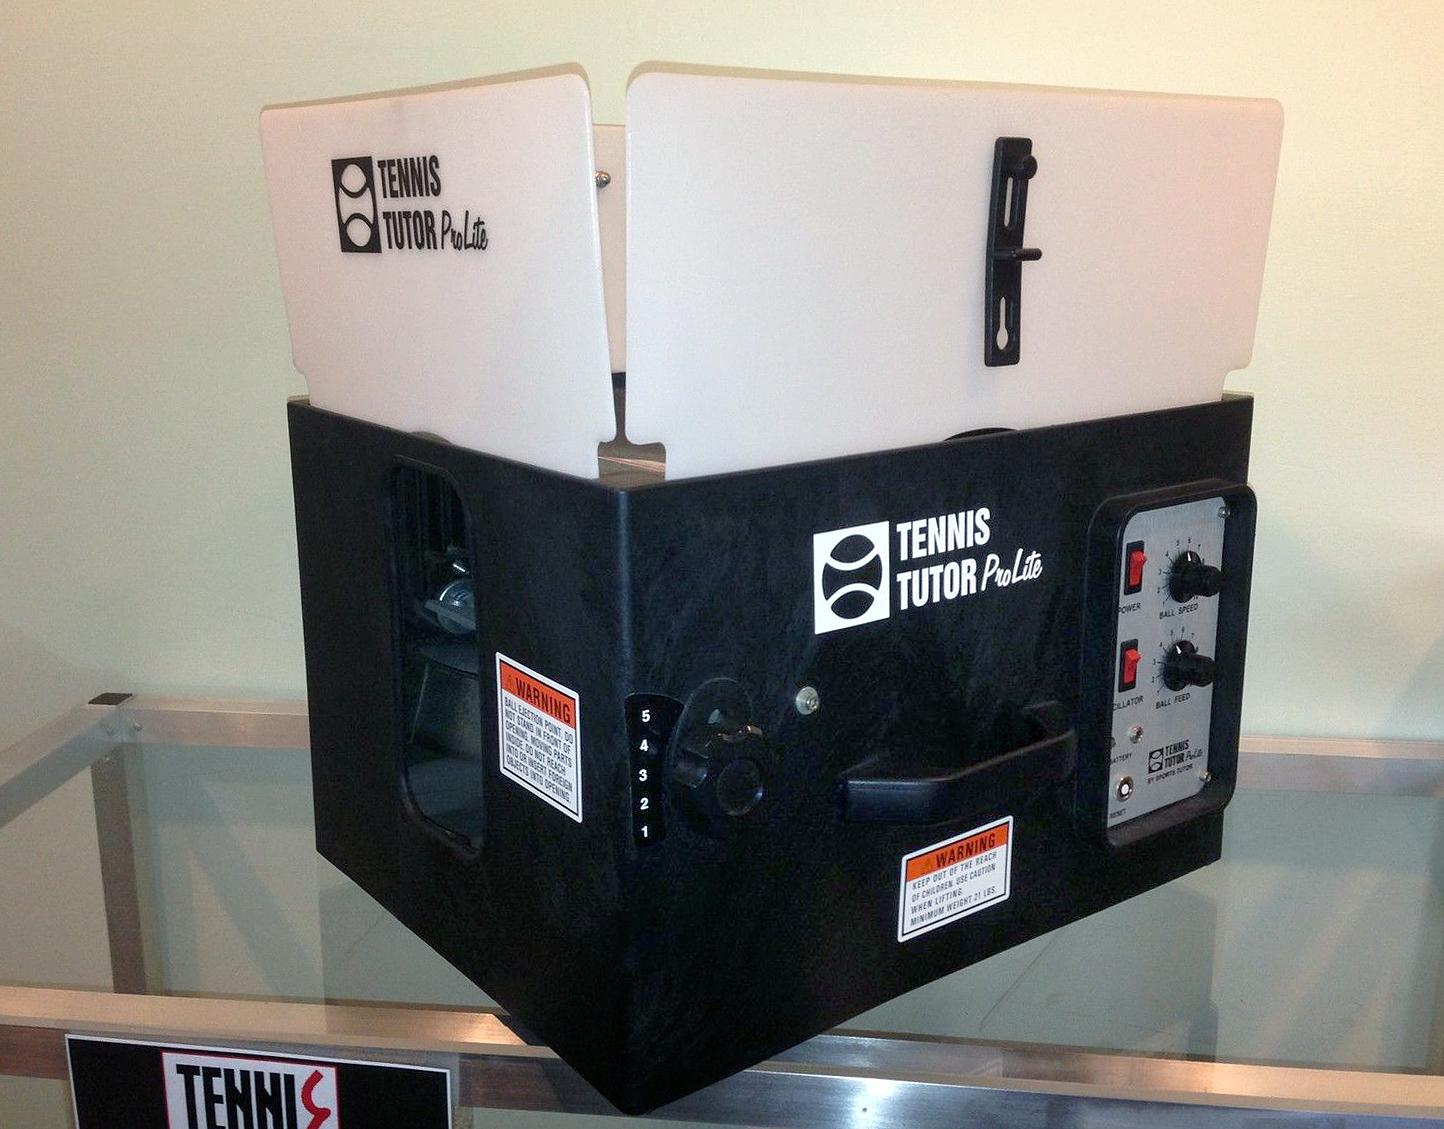 Tennis Ball Machines – New and used tennis ball machines